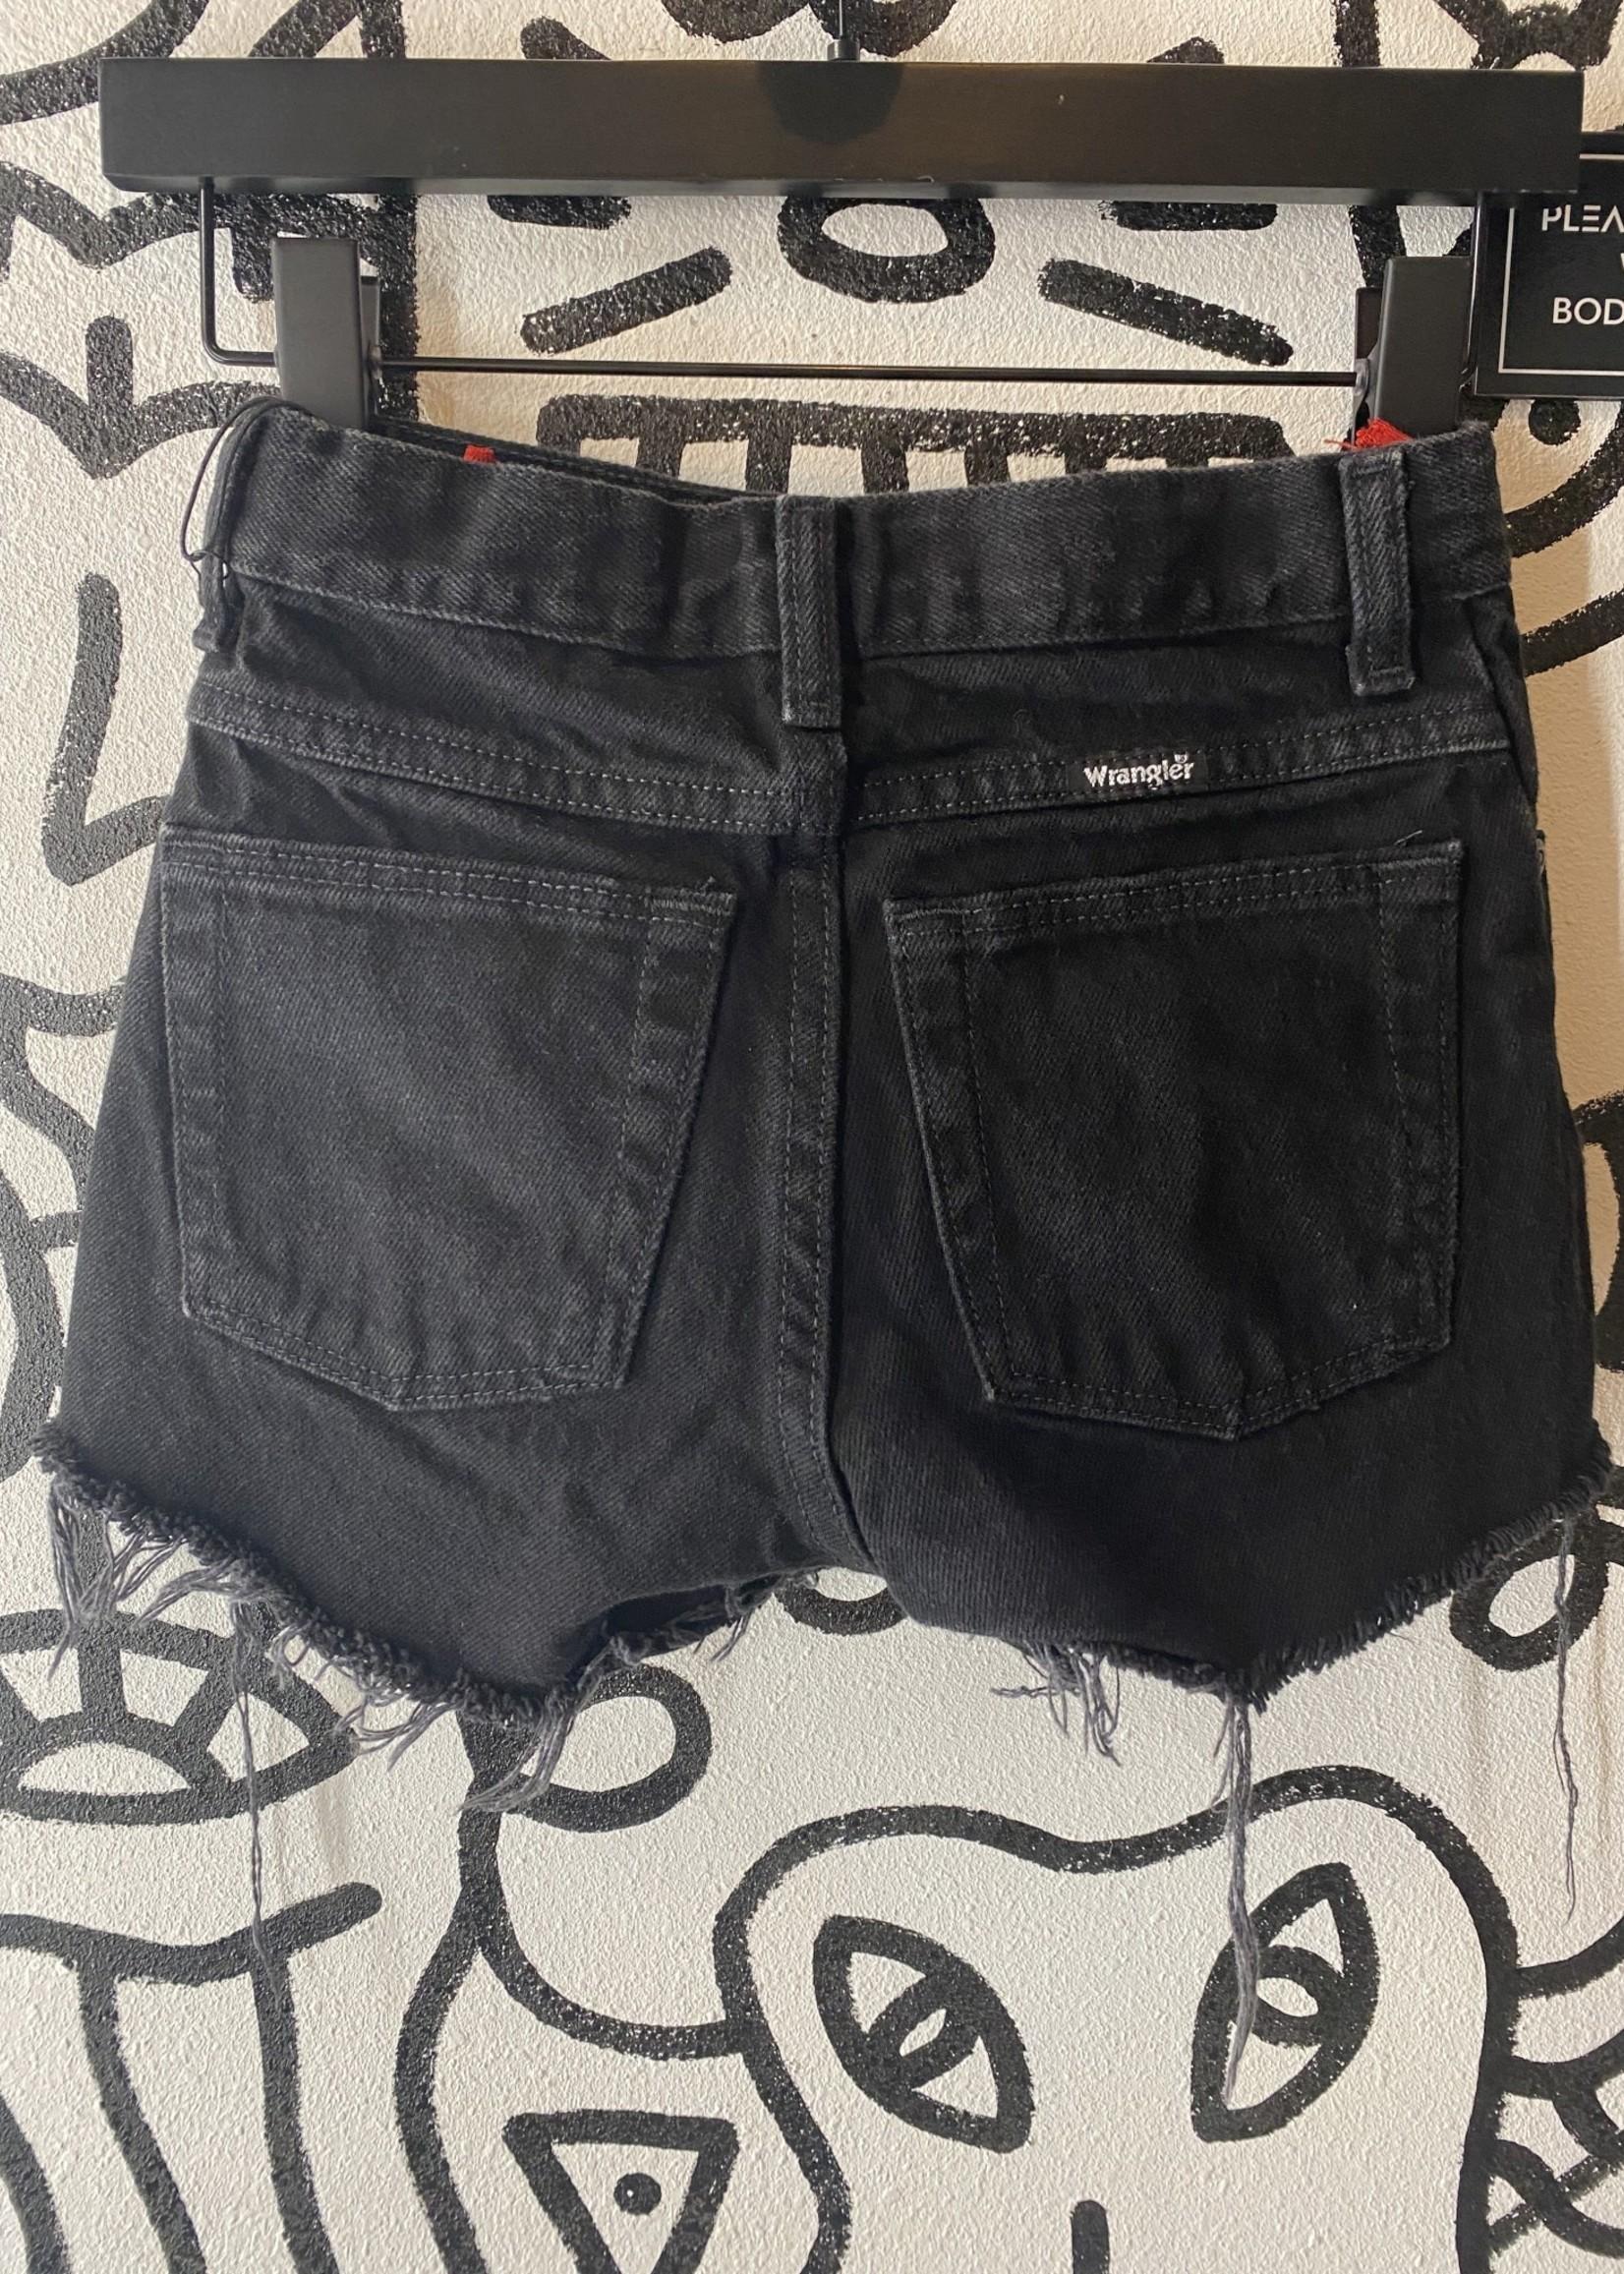 Wrangler Black Denim Shorts 23